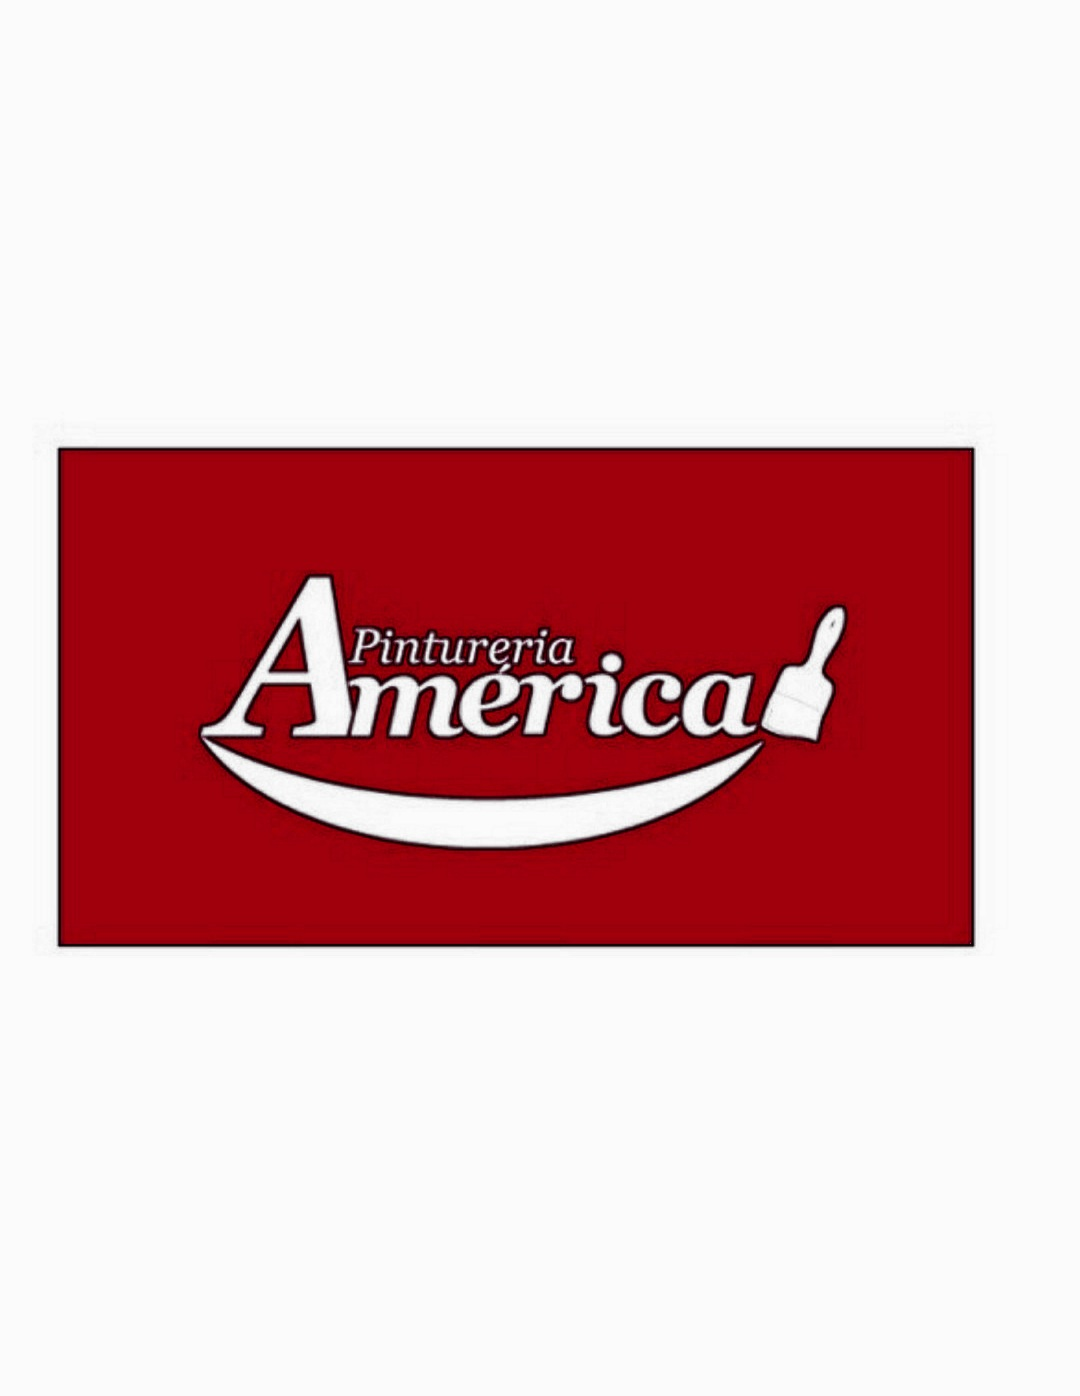 Pinturería America